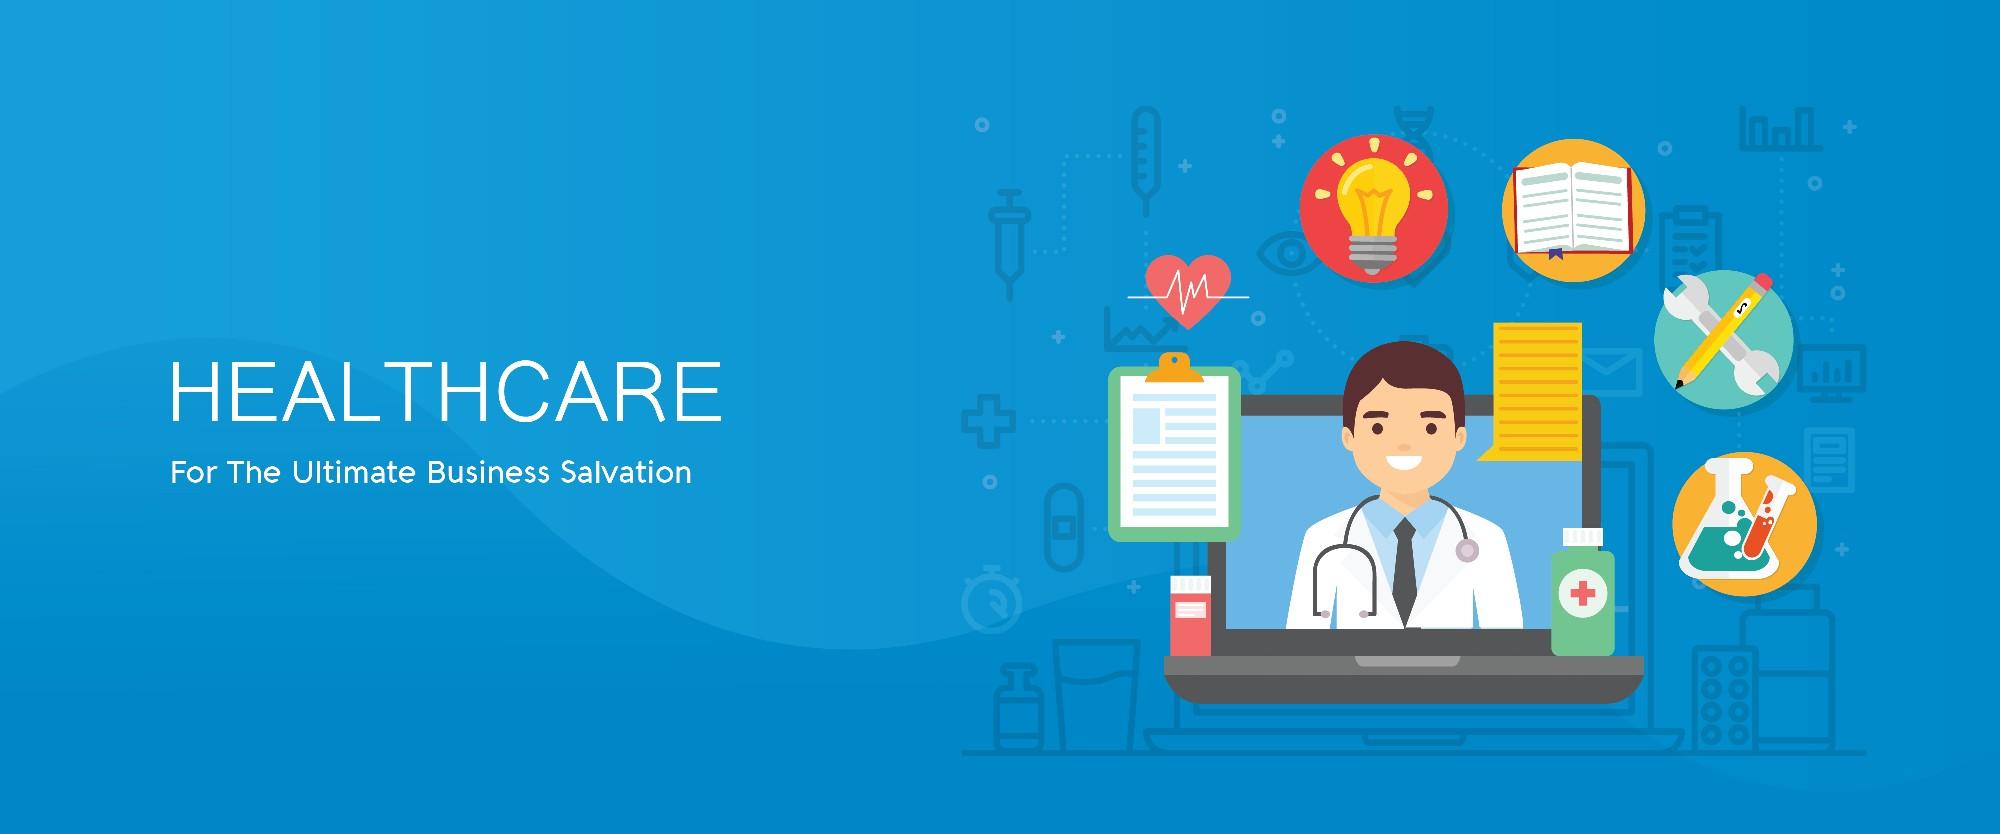 7.Healthcare-01